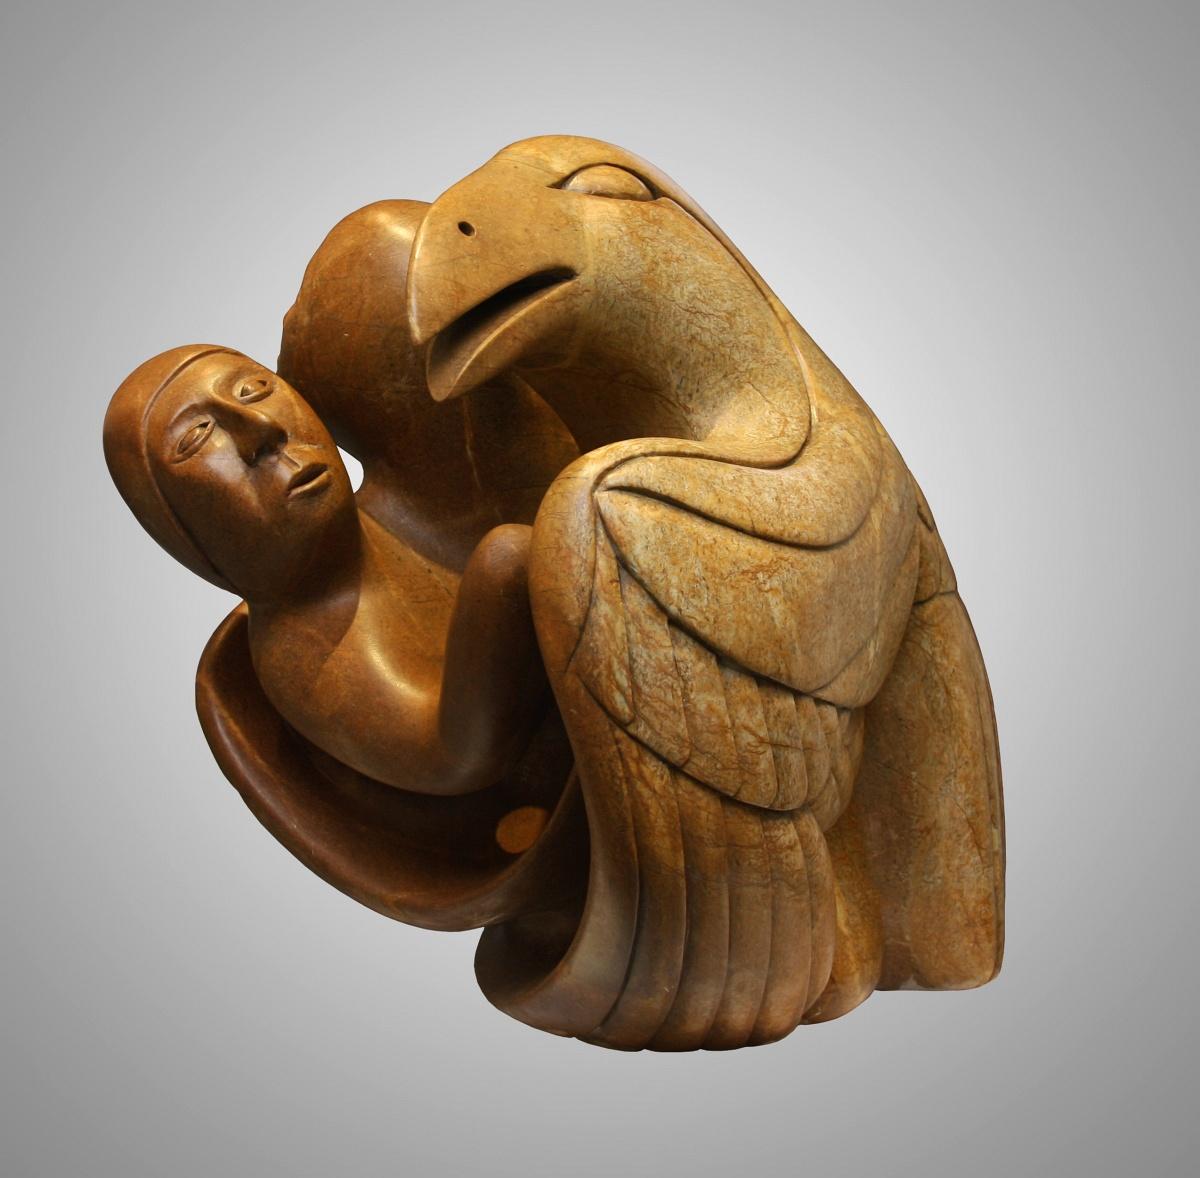 Abraham-Ruben-Raven-Spirit-Protector-1.jpg